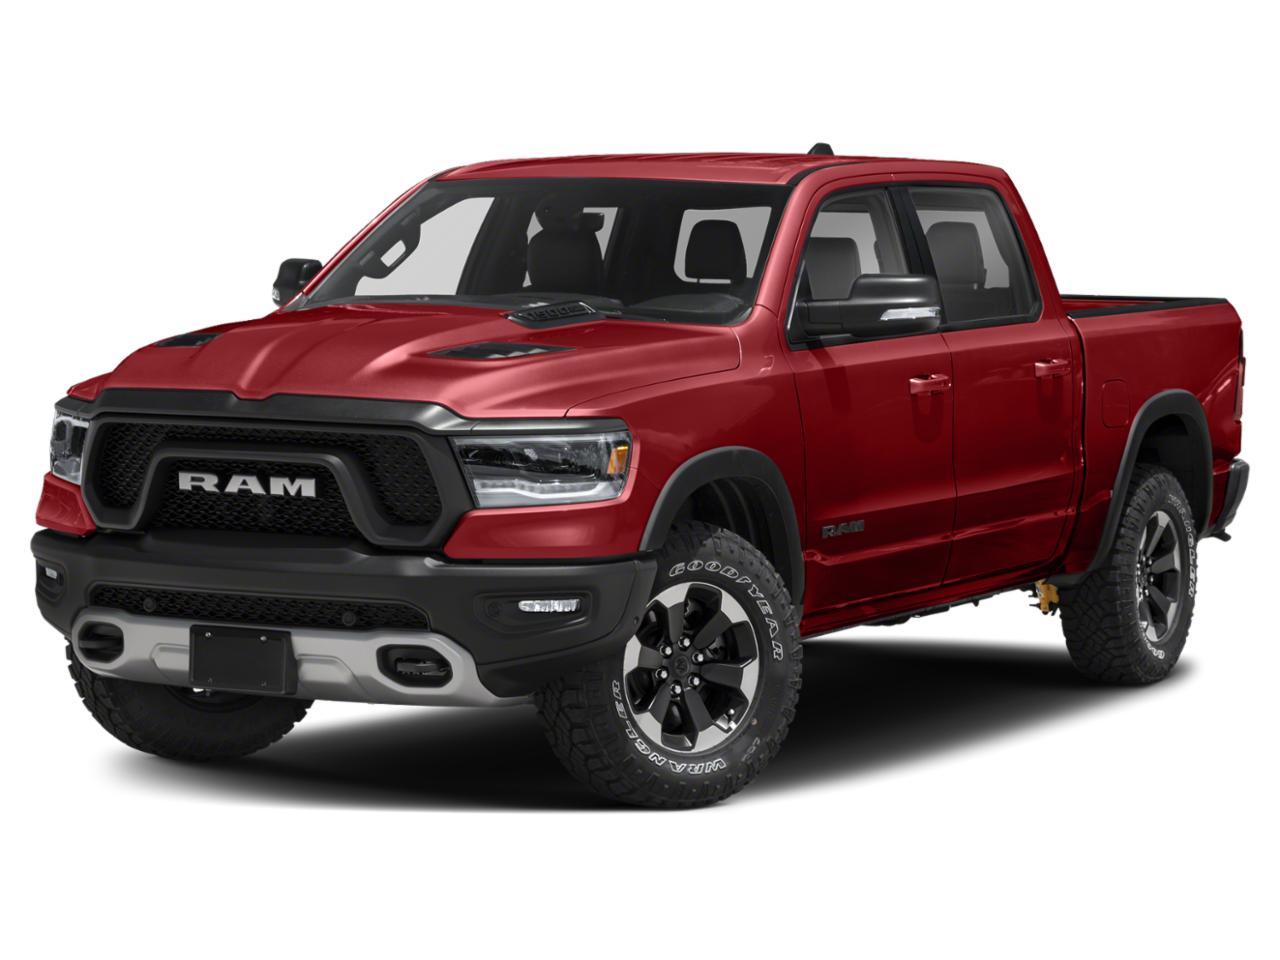 2019 Ram 1500 Vehicle Photo in Torrington, CT 06790